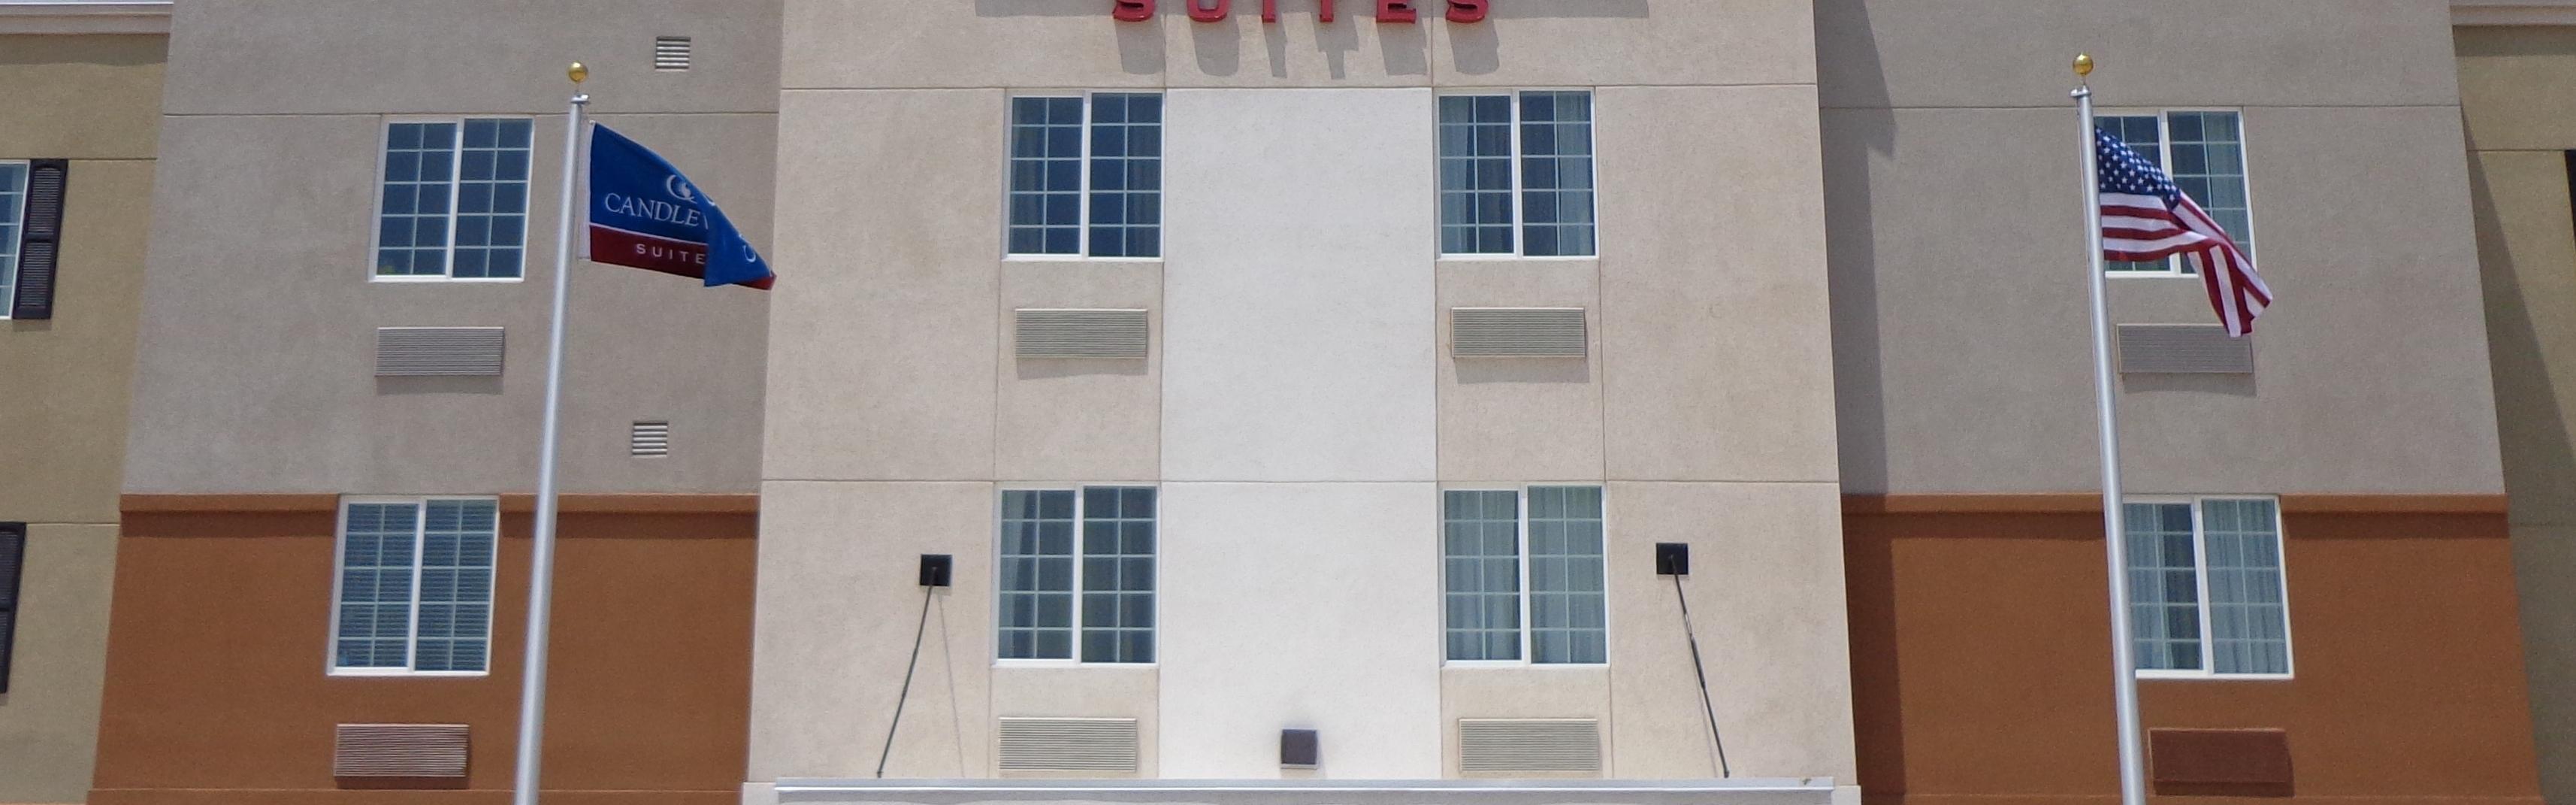 Motels Near Vcu